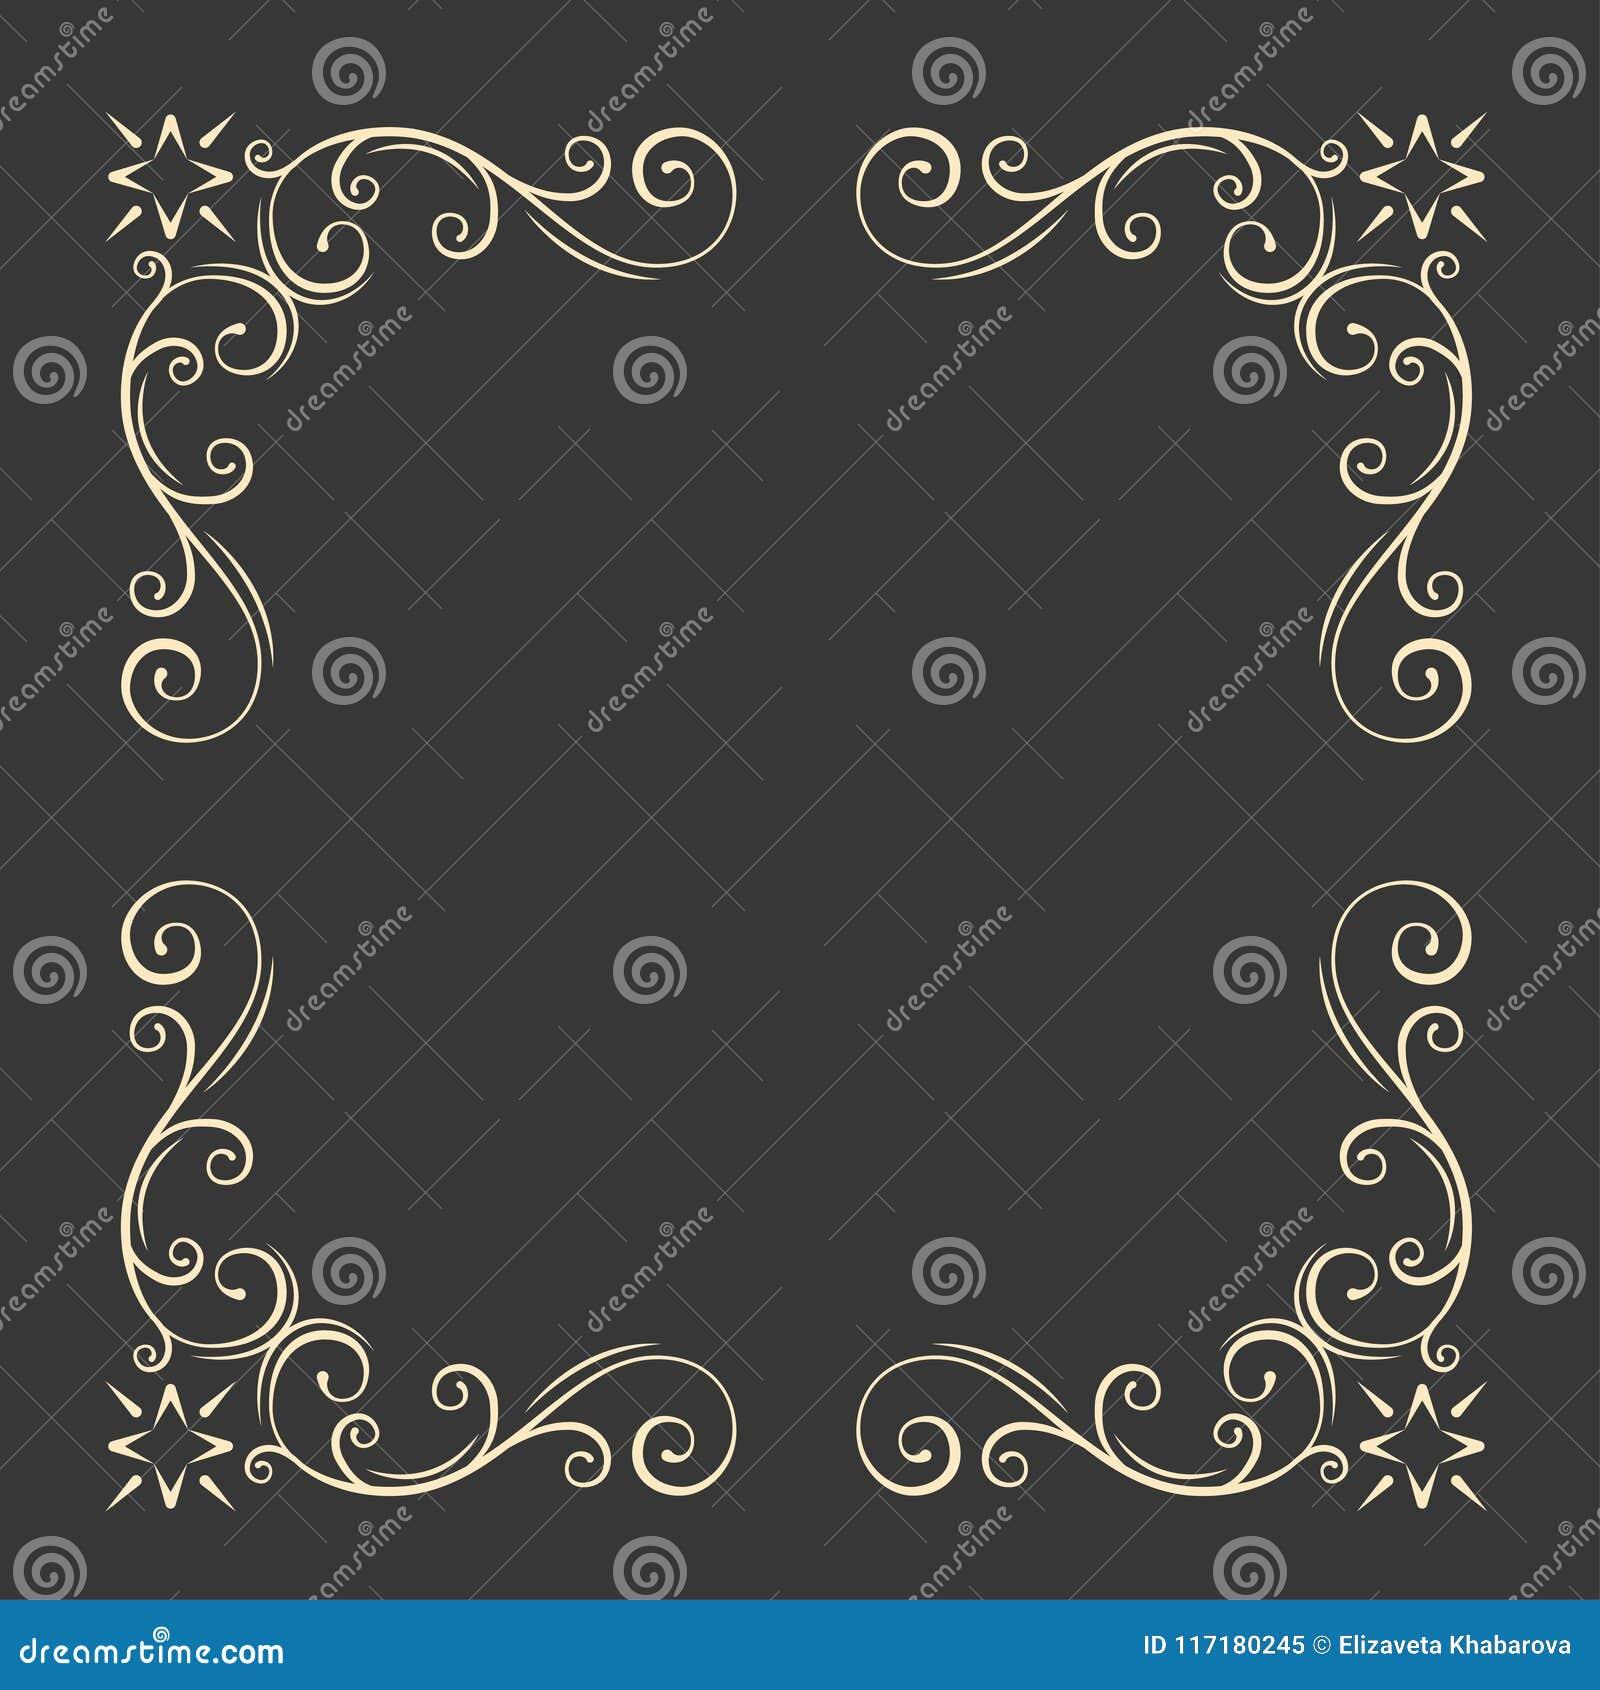 Ornamental decorative frame. Swirls, floral filigree elements. Vintage style. Wedding invitation, Greeting card design. Vector.